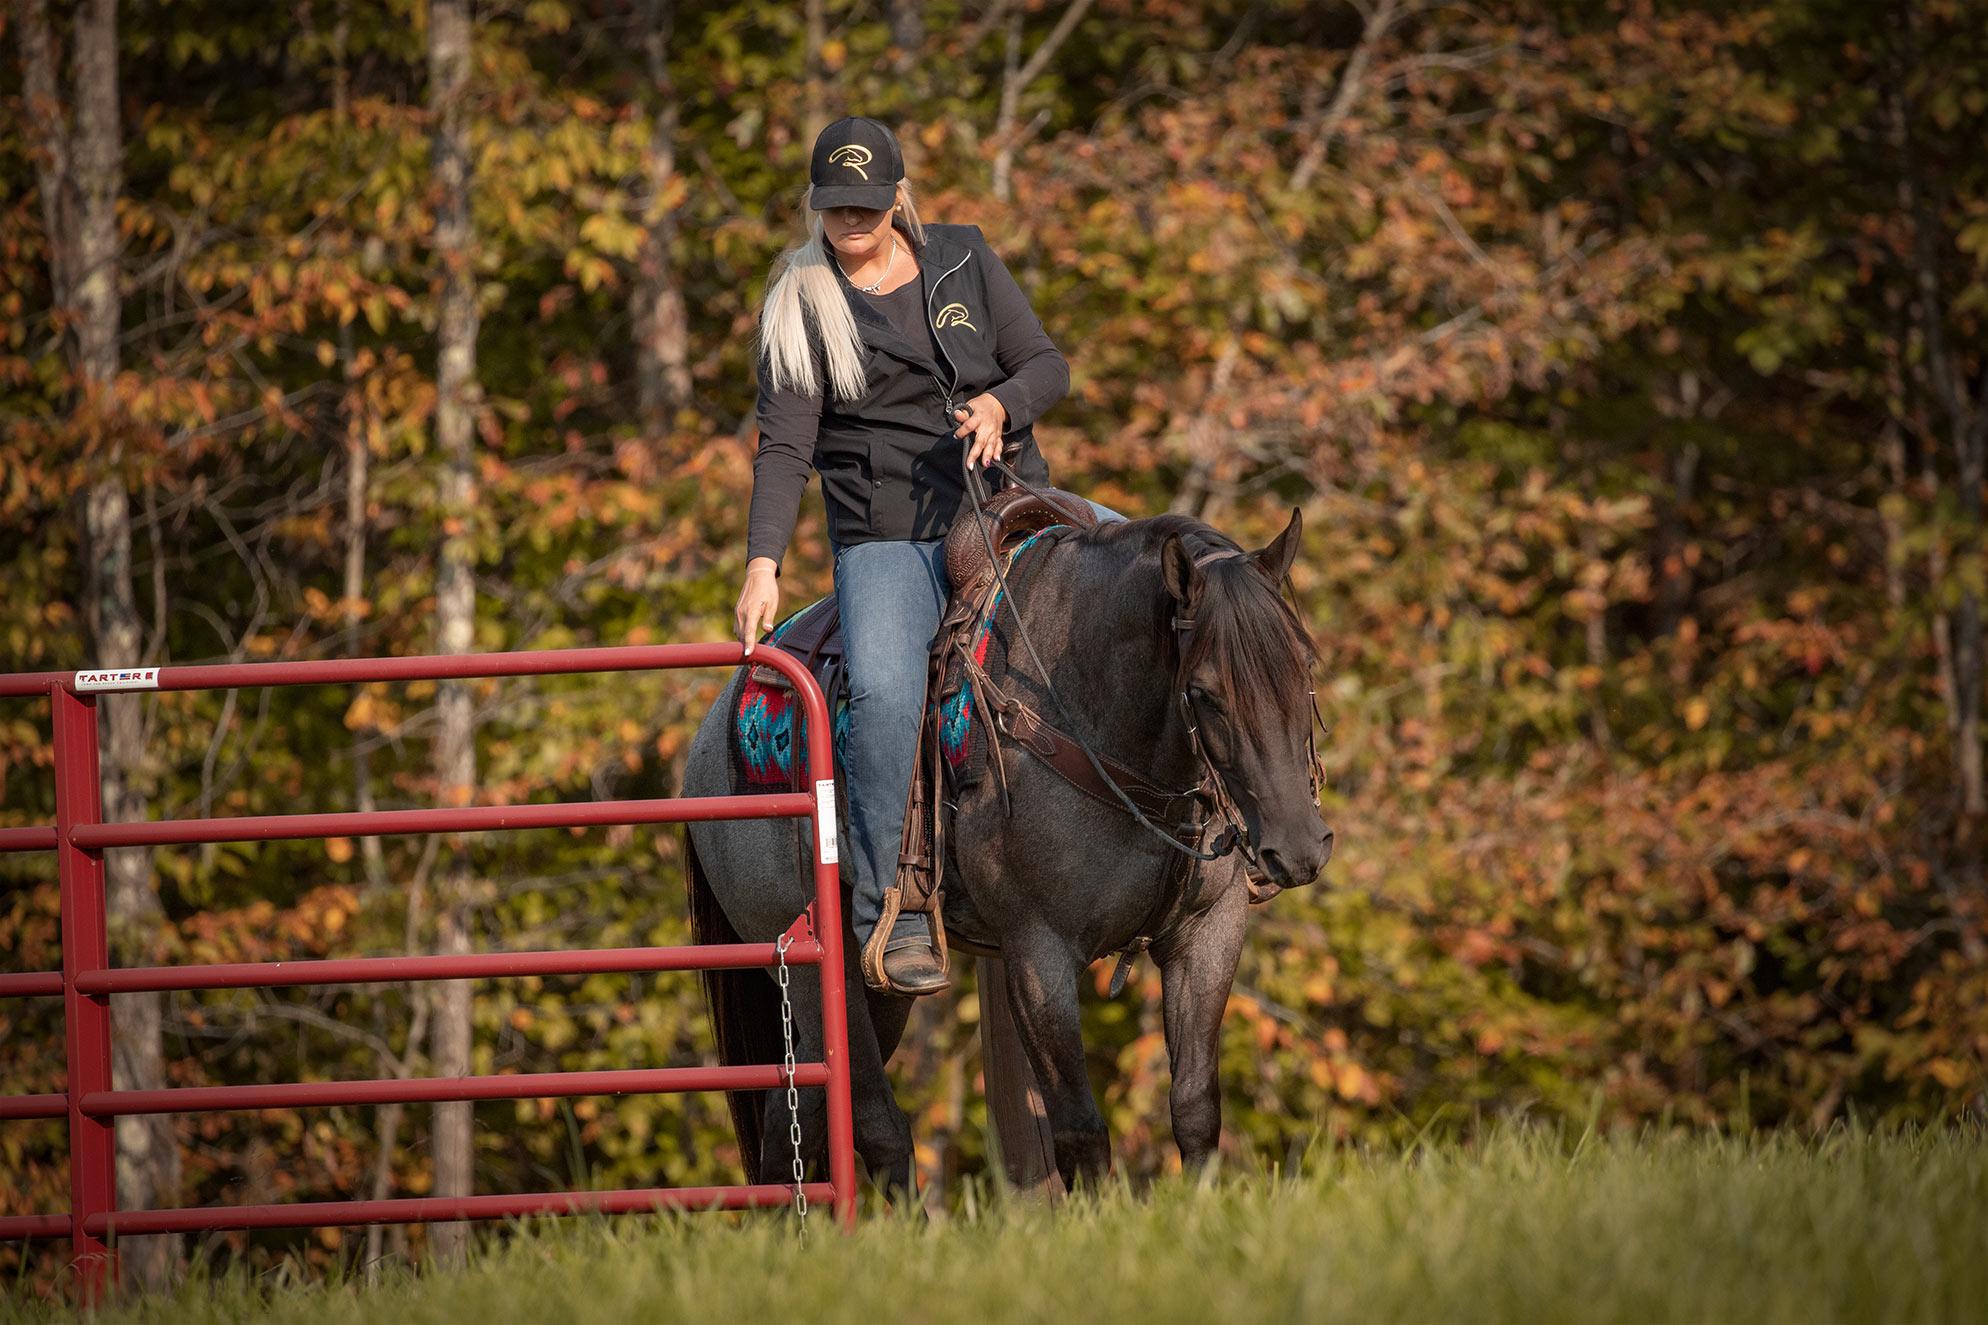 021-Gunsmoke-Luxury-Trail-Horse-For-Sale